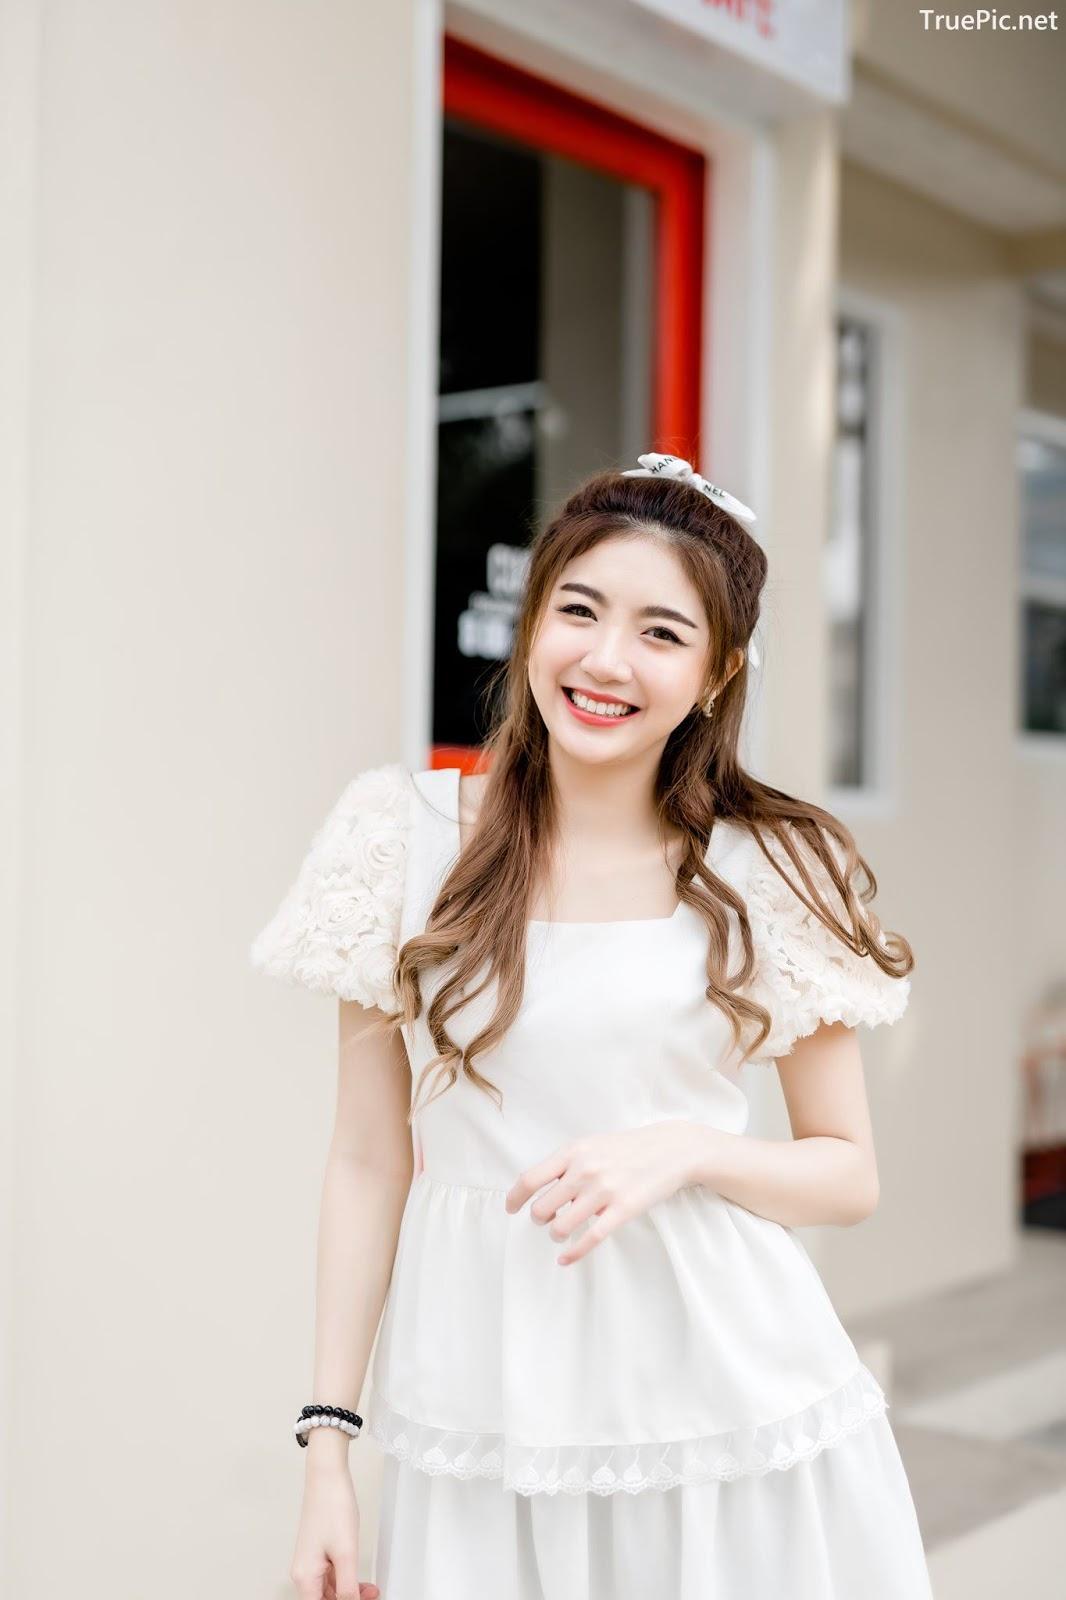 Image Thailand Model - Sasi Ngiunwan - Barbie Doll Smile - TruePic.net - Picture-2